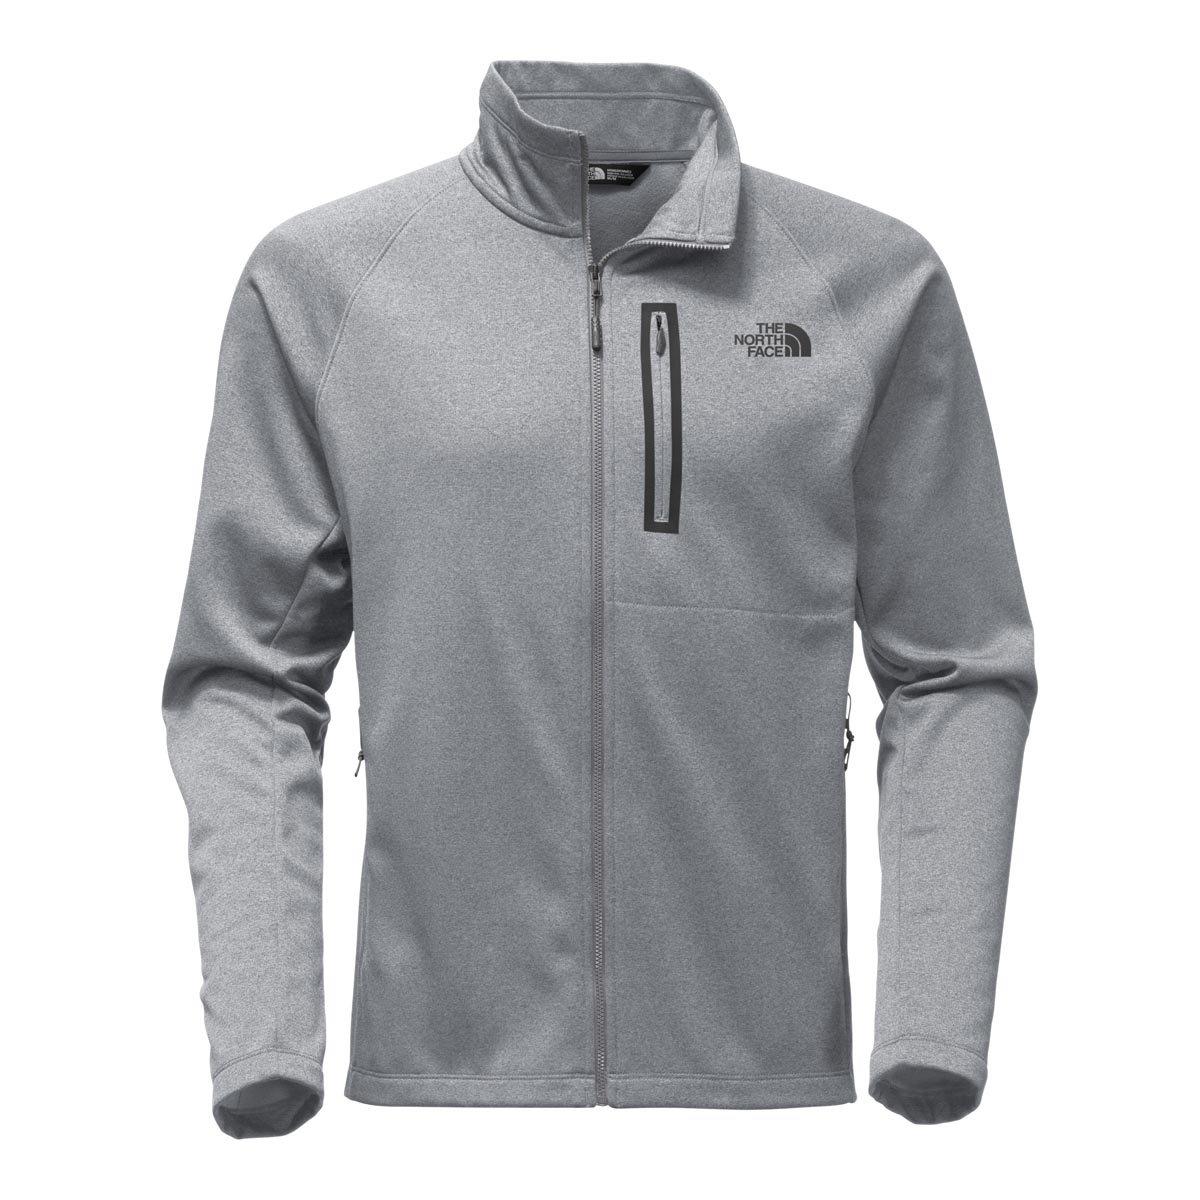 The North Face Men's Canyonlands Full Zip TNF Medium Grey Heather - XL